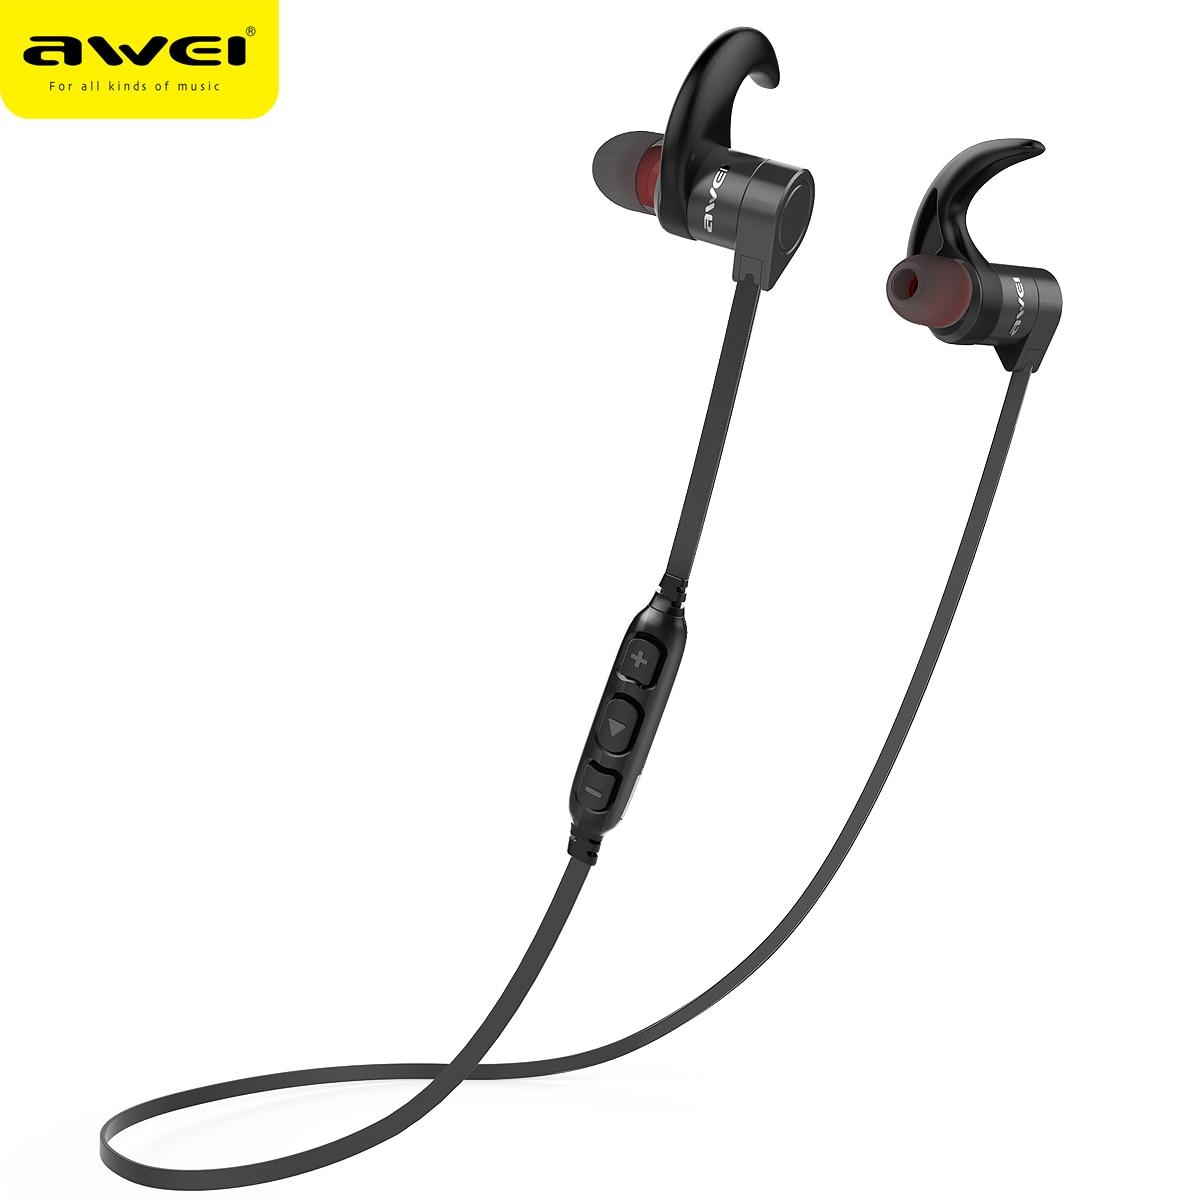 AWEI AK3 Bluetooth Earphone Waterproof Wireless Headset Casque With Microphone Cordless Earphone Earpiece Audifonos Earbuds awei ak3 gold